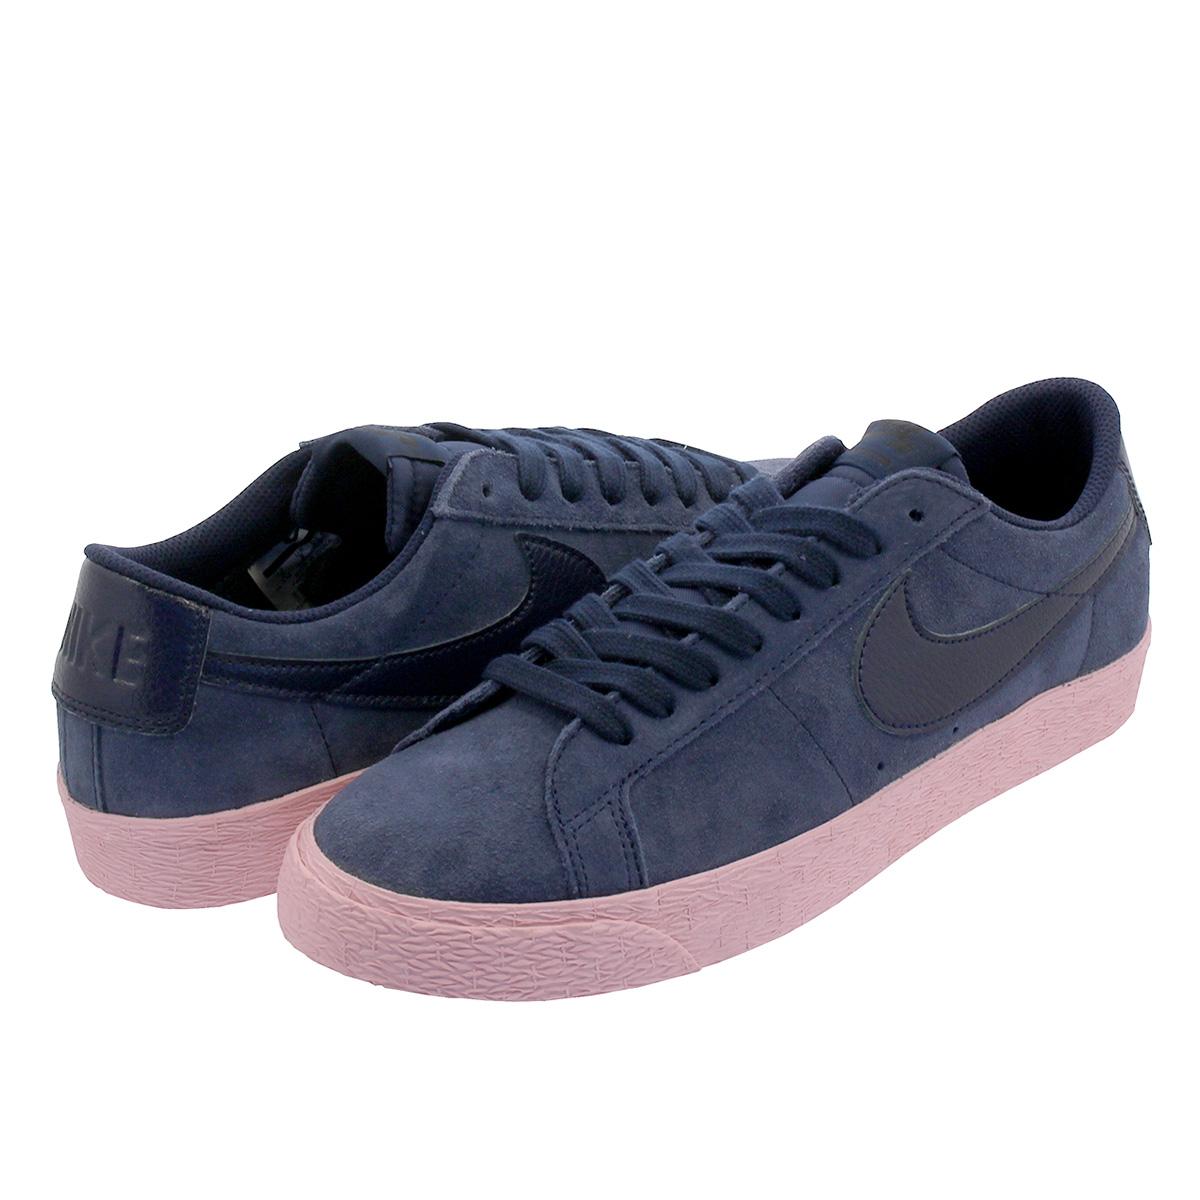 SELECT SHOP LOWTEX  NIKE SB BLAZER ZOOM LOW Nike SB blazer zoom low OBSIDIAN  OBSIDIAN BUBBLEGUM 864 4270af771